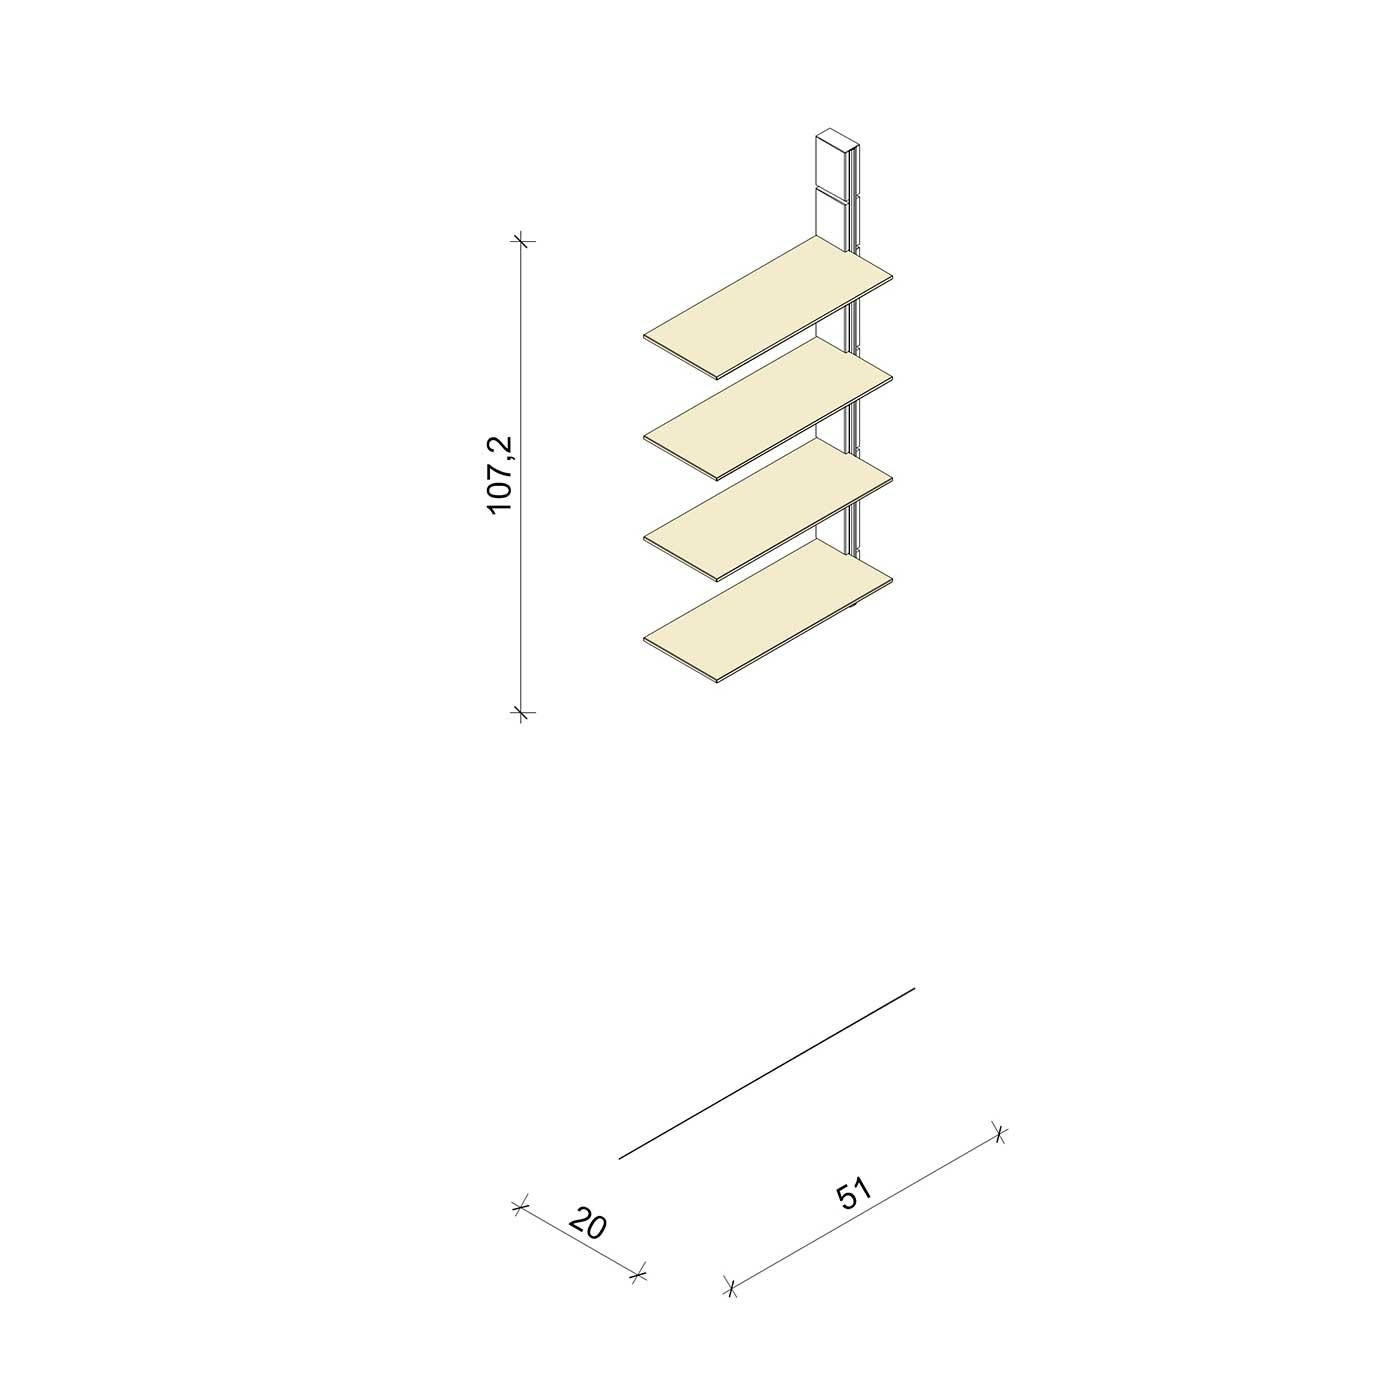 Bücherregal - Basic (M) - Anbauelement - Maß: 51 x 107,2 x 20 cm (B x H x T)